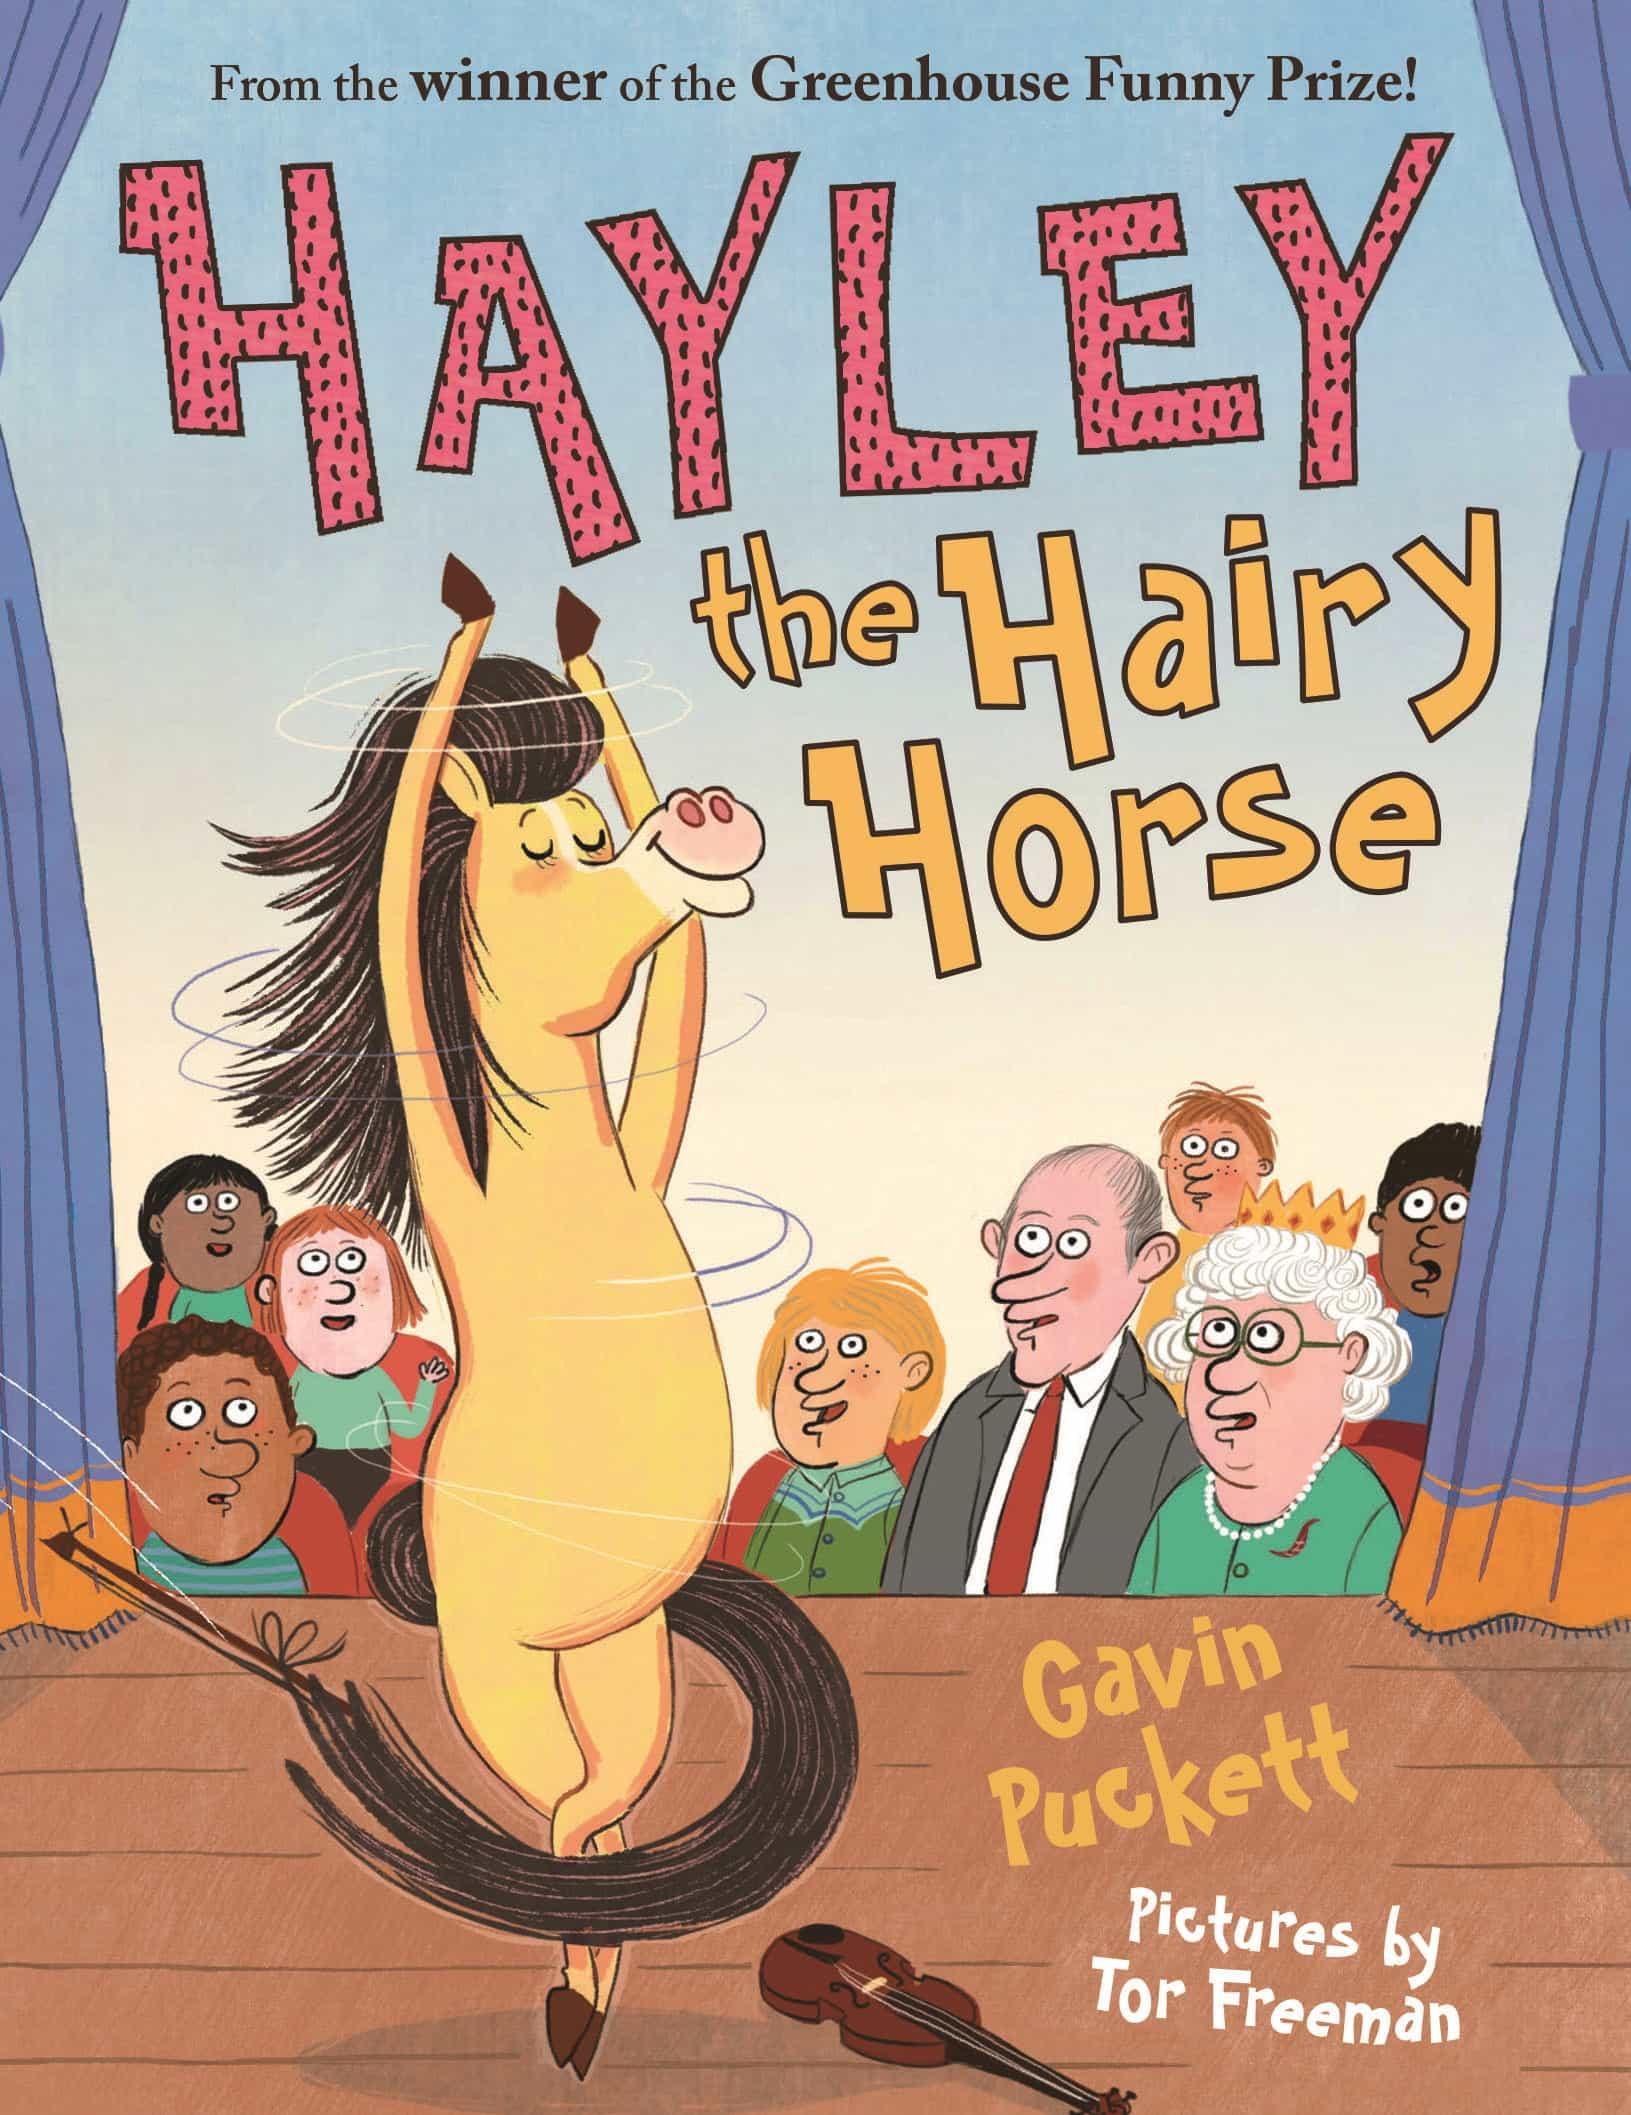 Hayley the Hairy Horse